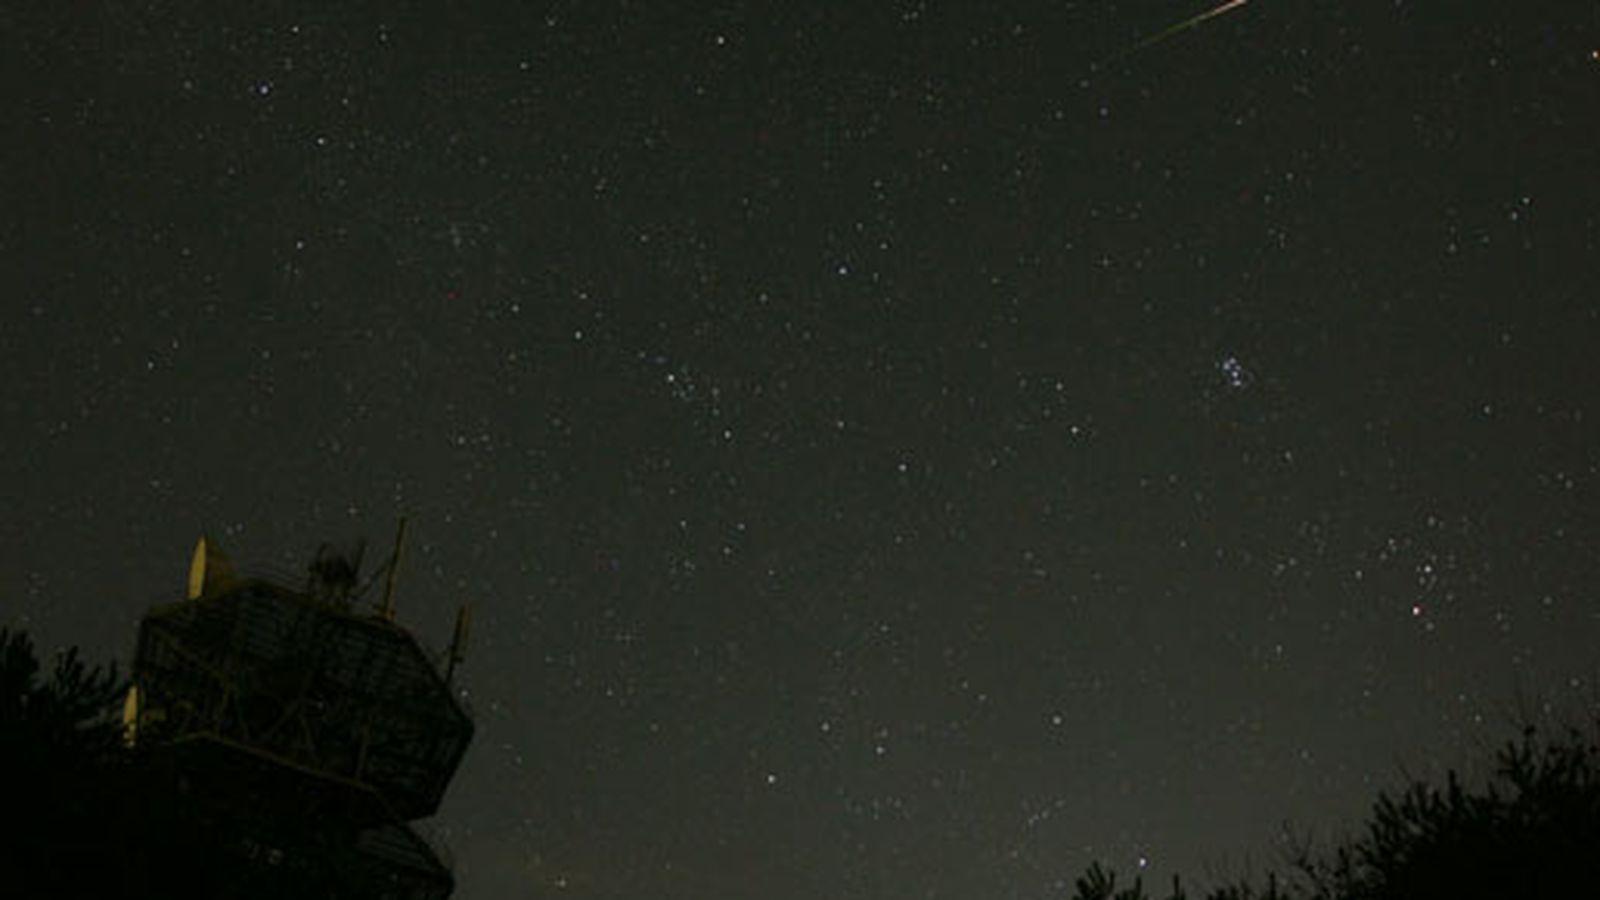 NASA to live stream peak of Eta Aquarid meteor shower ...